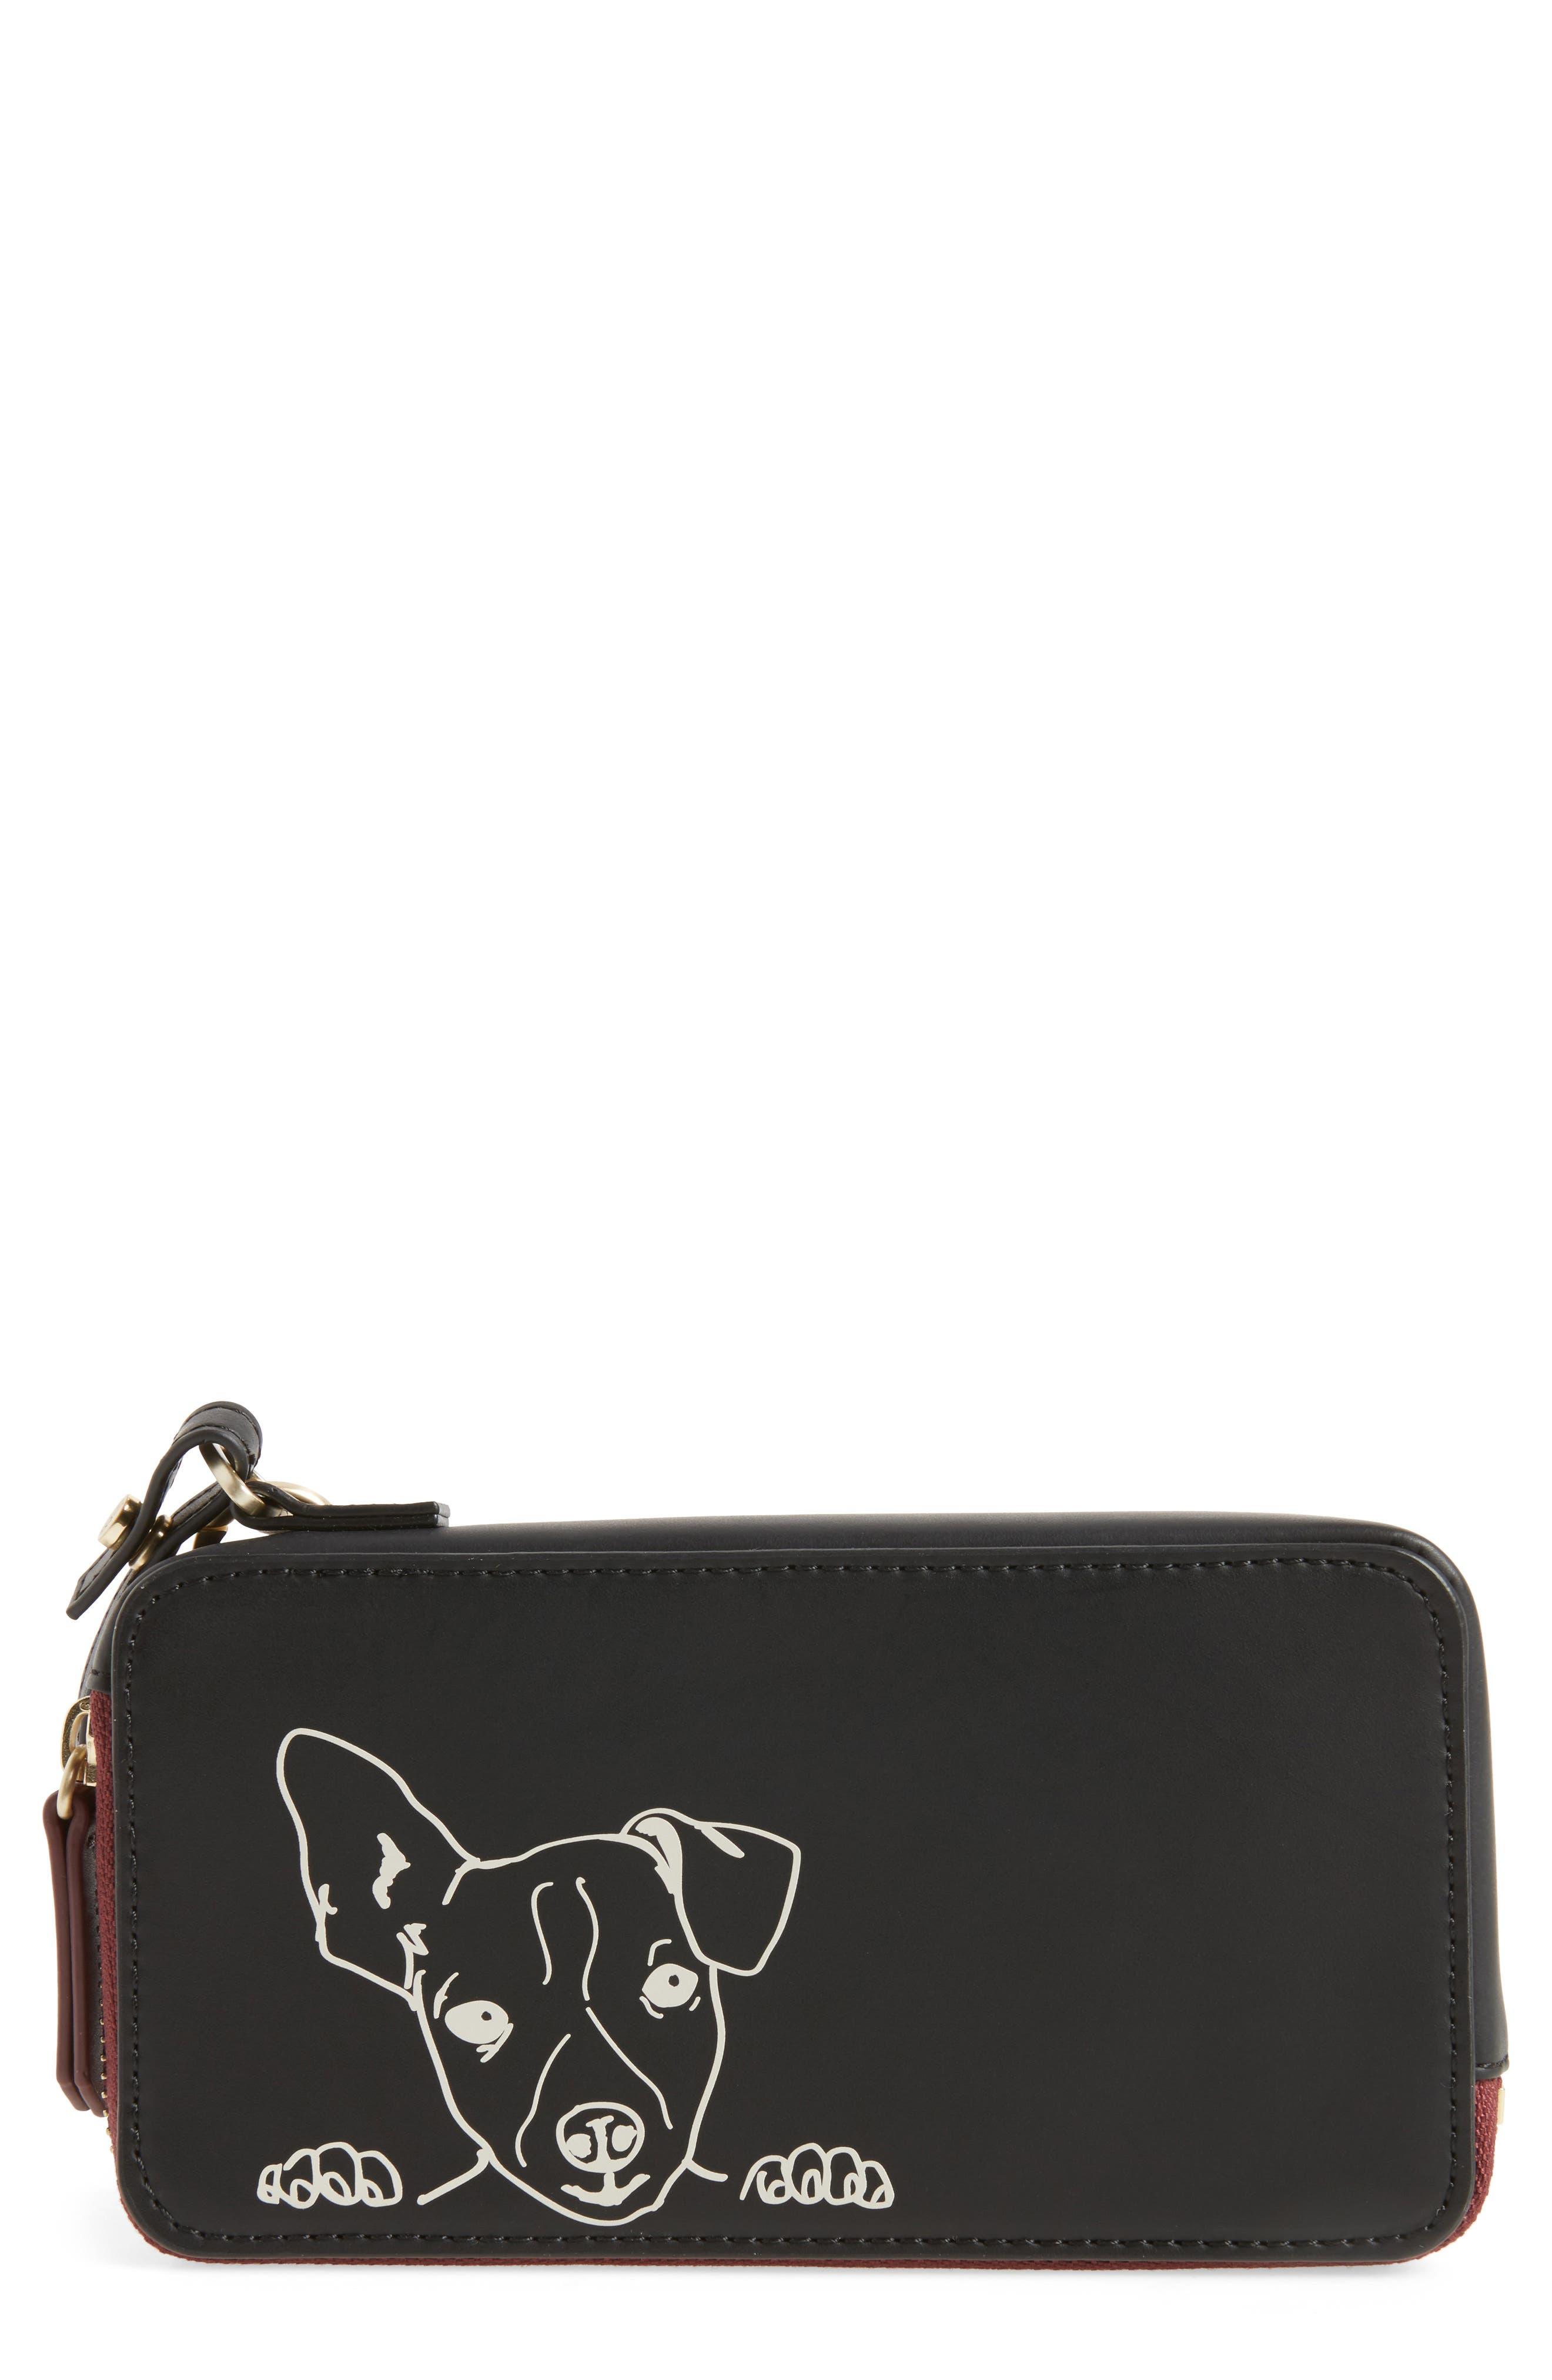 Brea Convertible Smartphone Leather Clutch,                         Main,                         color, Black